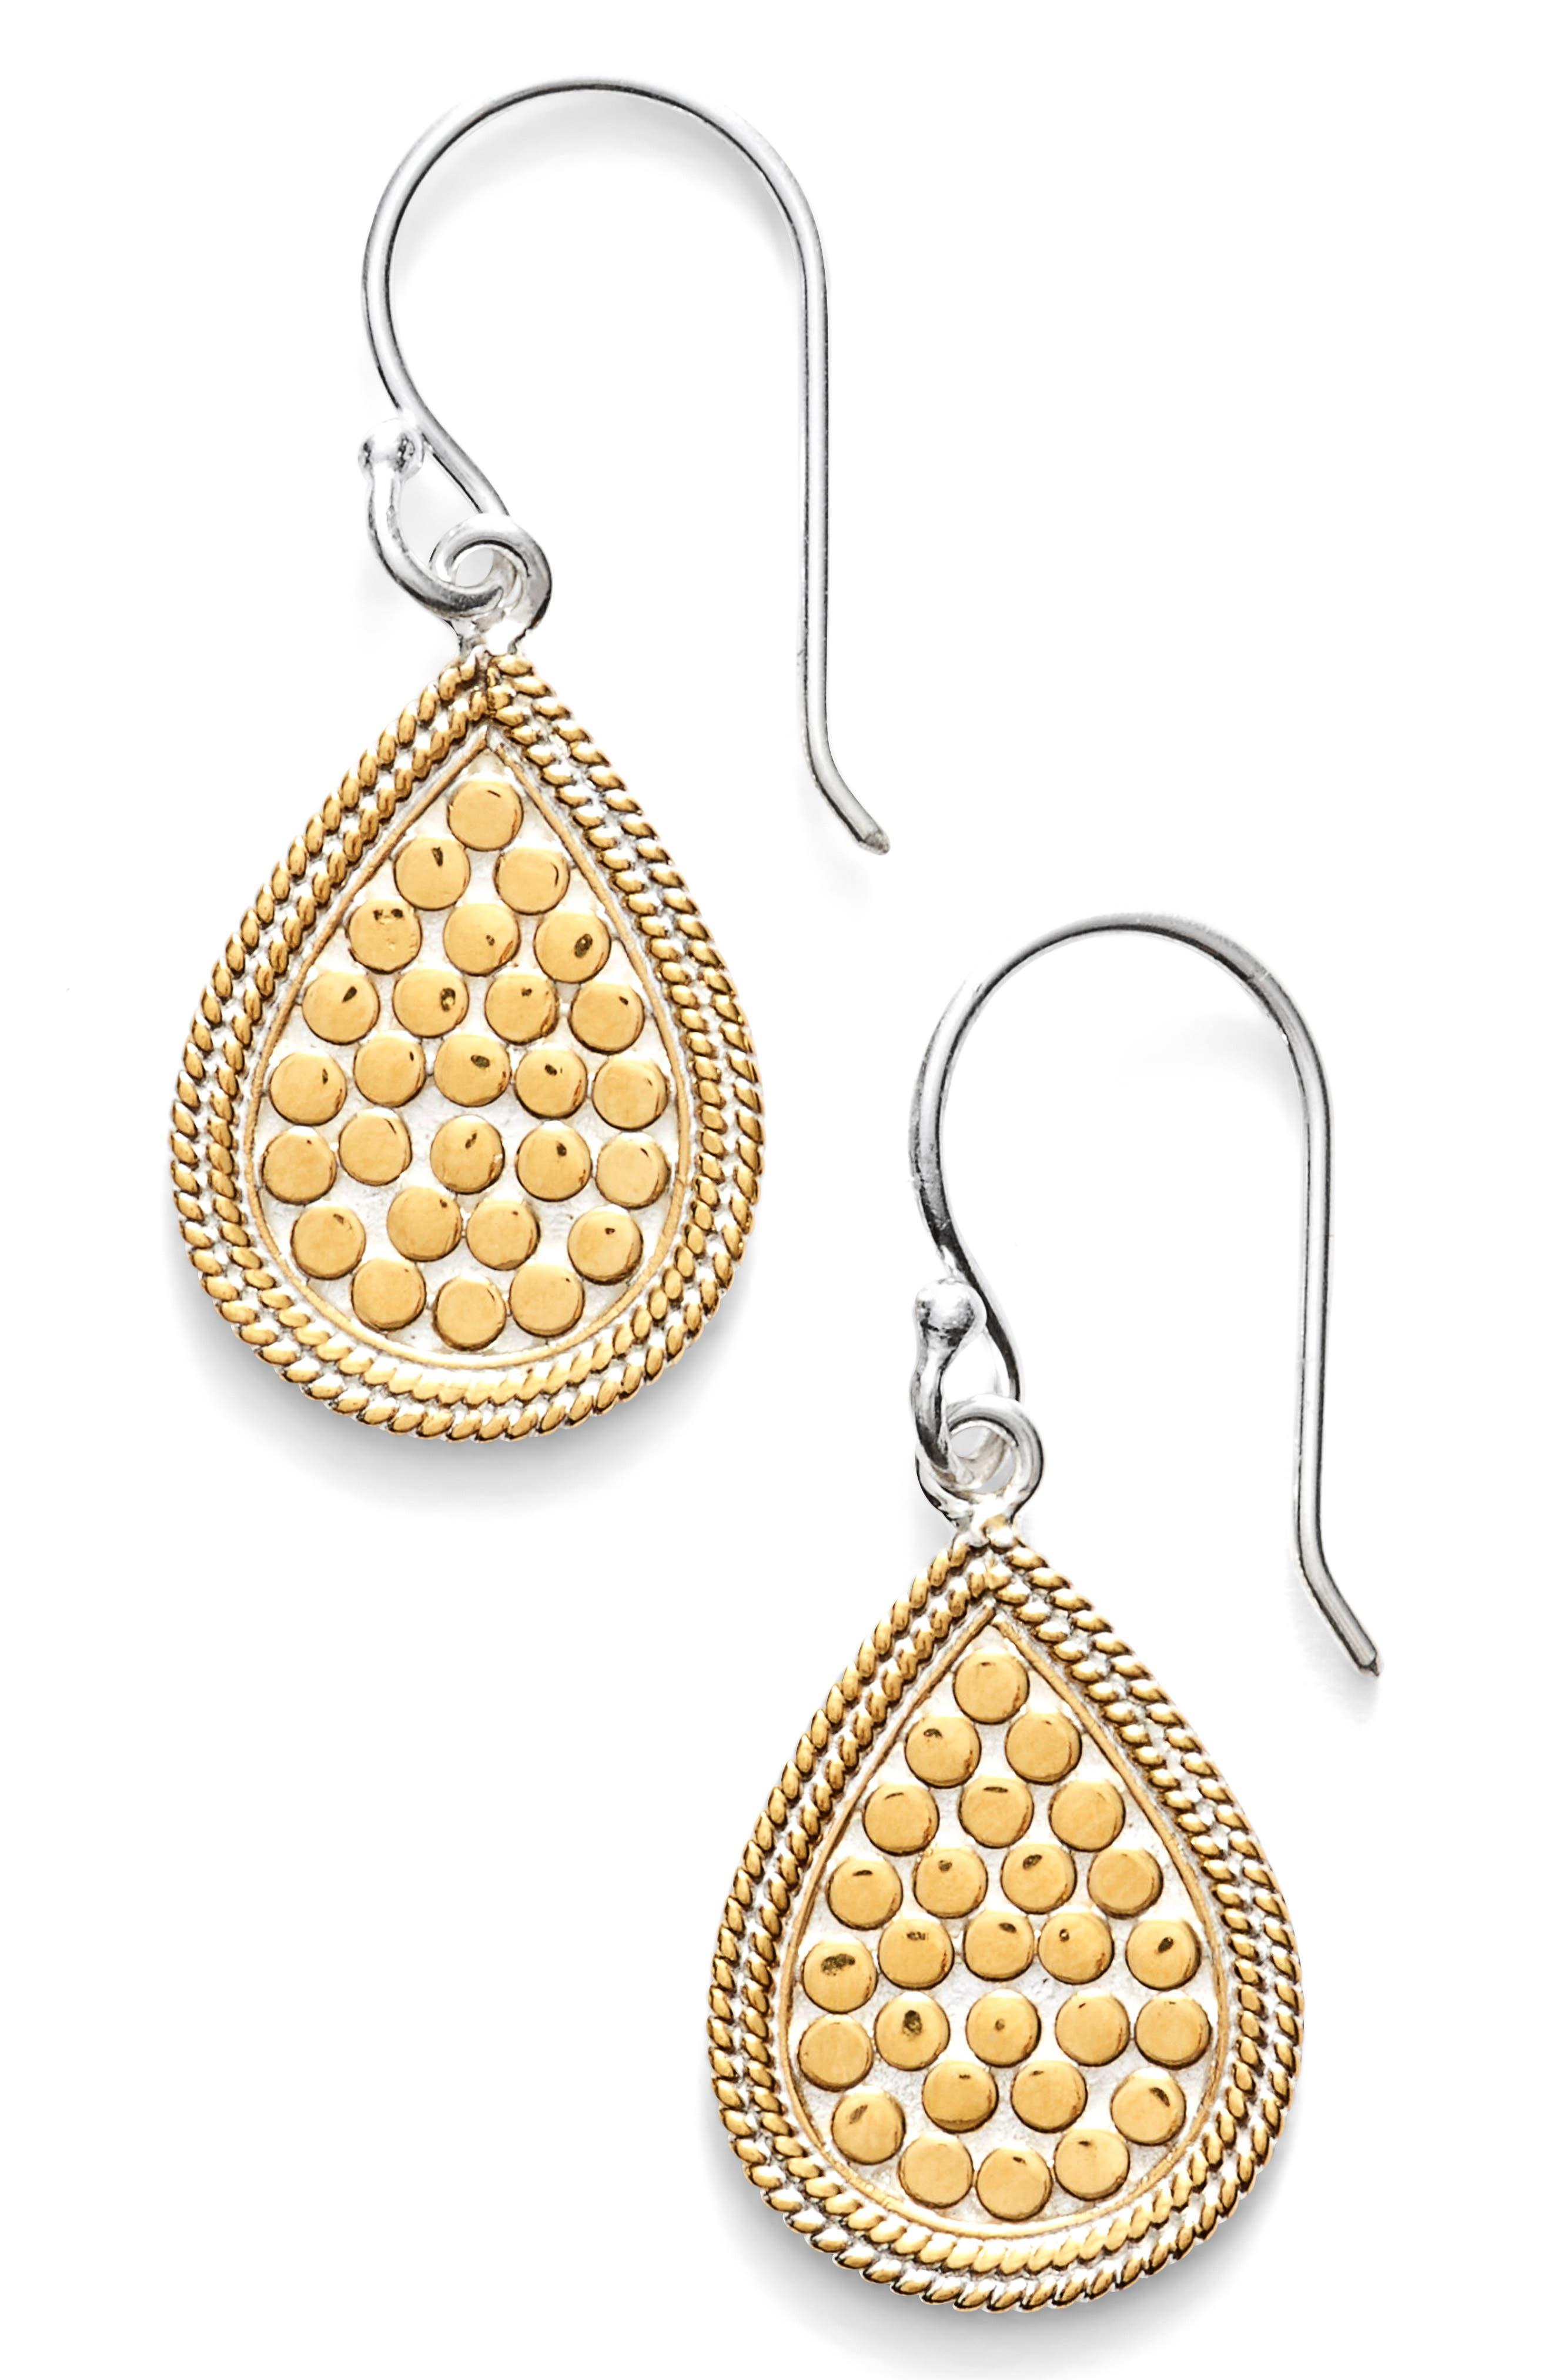 'Gili' Small Teardrop Earrings,                             Main thumbnail 1, color,                             GOLD/ SILVER